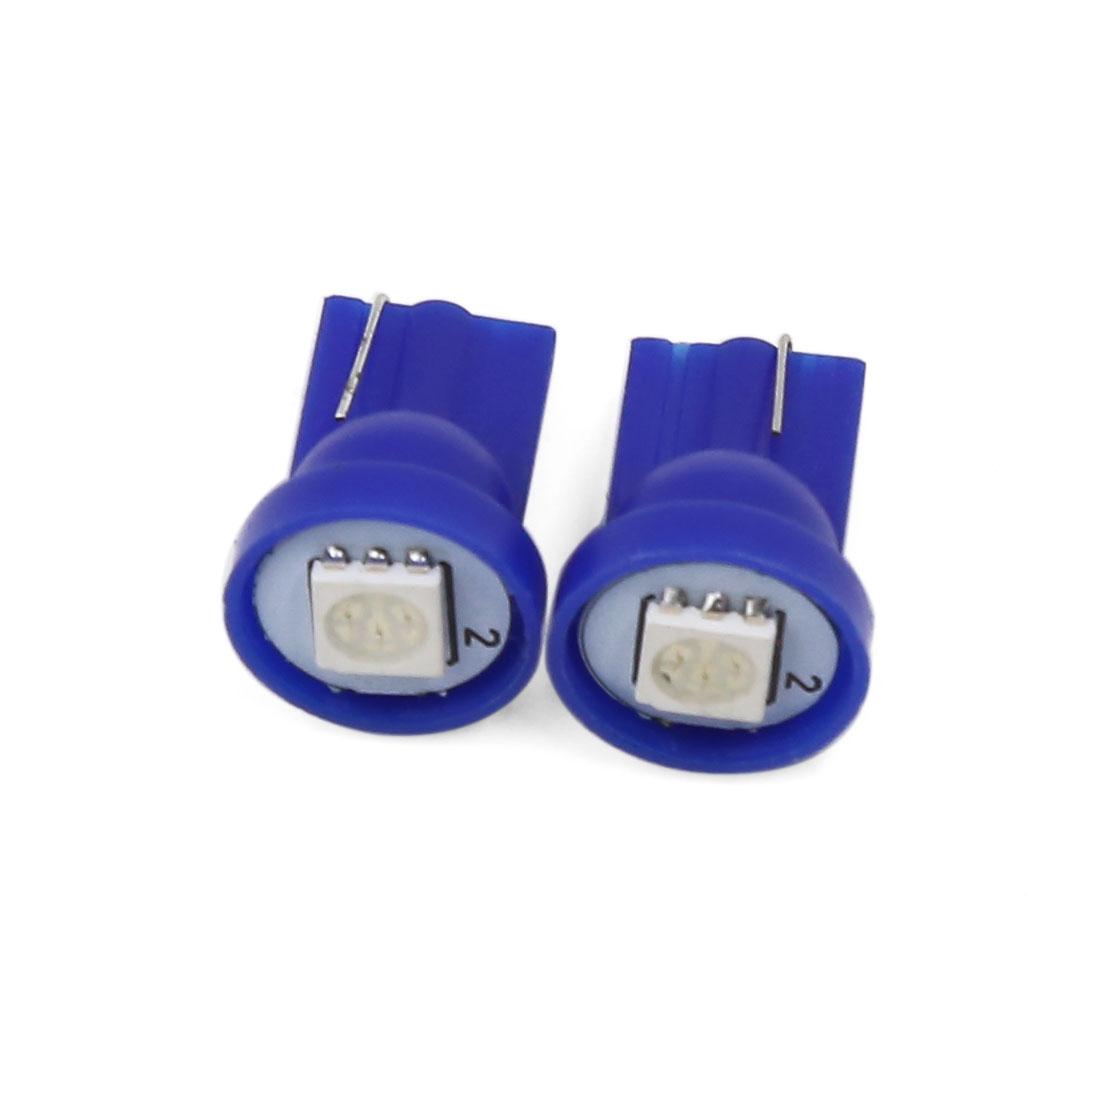 2 Pcs T10 W5W 5050 SMD LED Car Side Wedge Tail Light Lamp Bulb Blue Interior